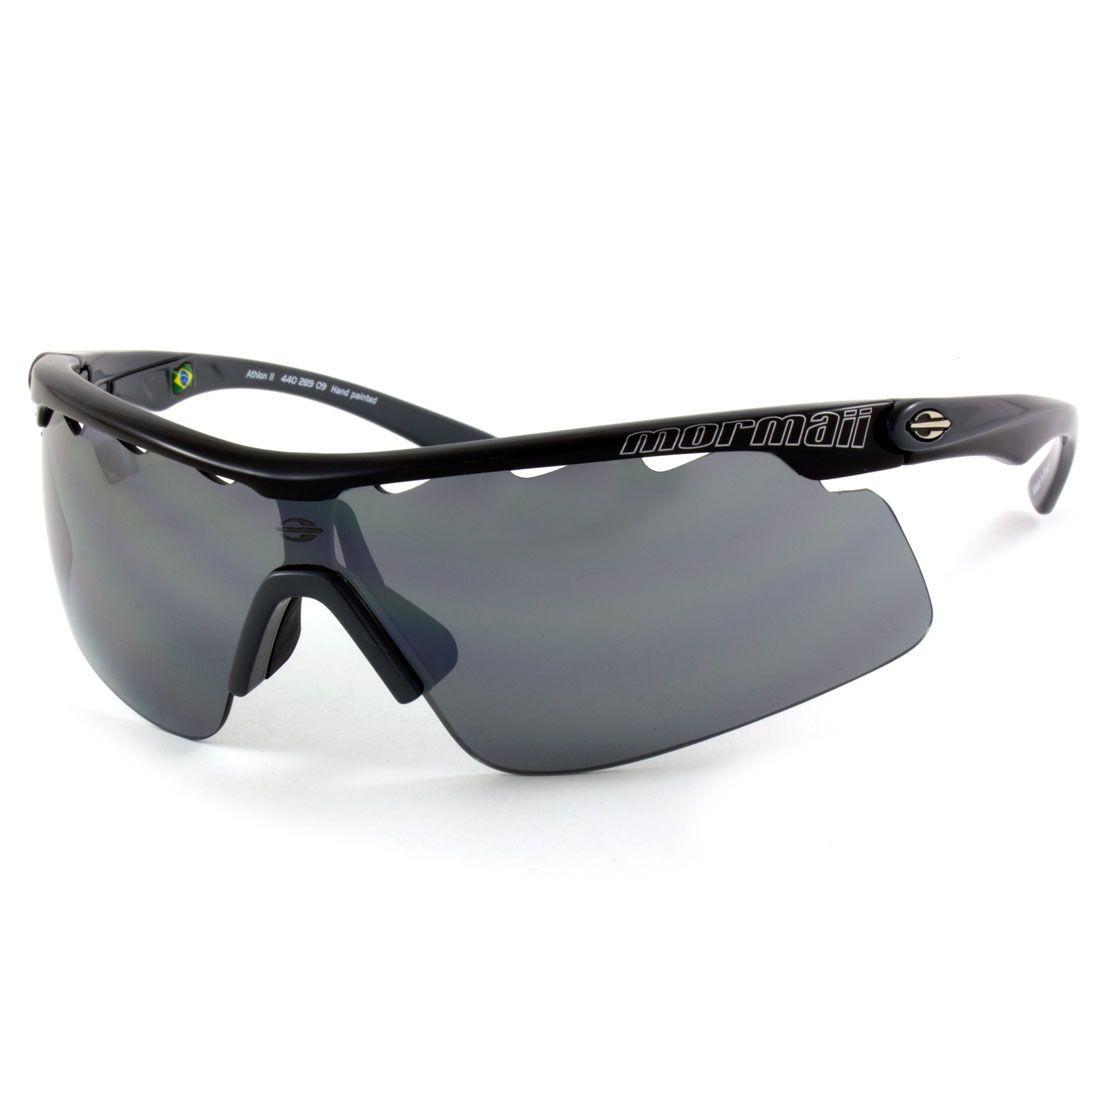 7d507e7f6b823 Óculos de de Sol Mormaii Athlon 2 440 289 09 - Omega Ótica e Relojoaria